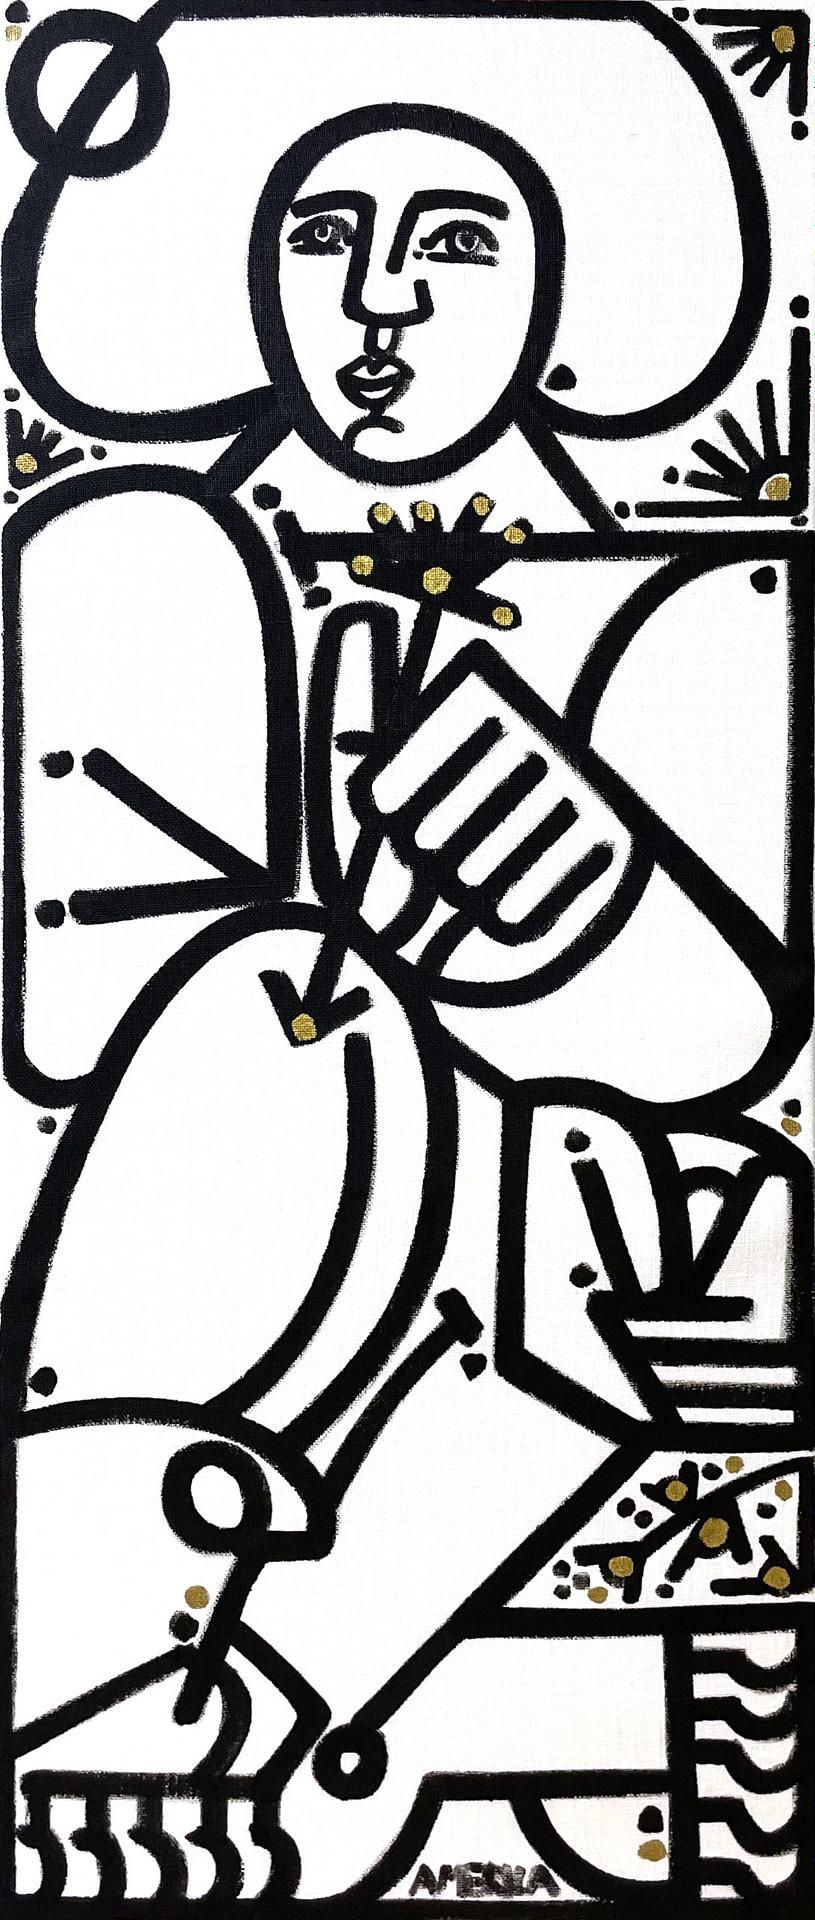 america martin, joanne artman gallery, linen painting, black and white, figurative